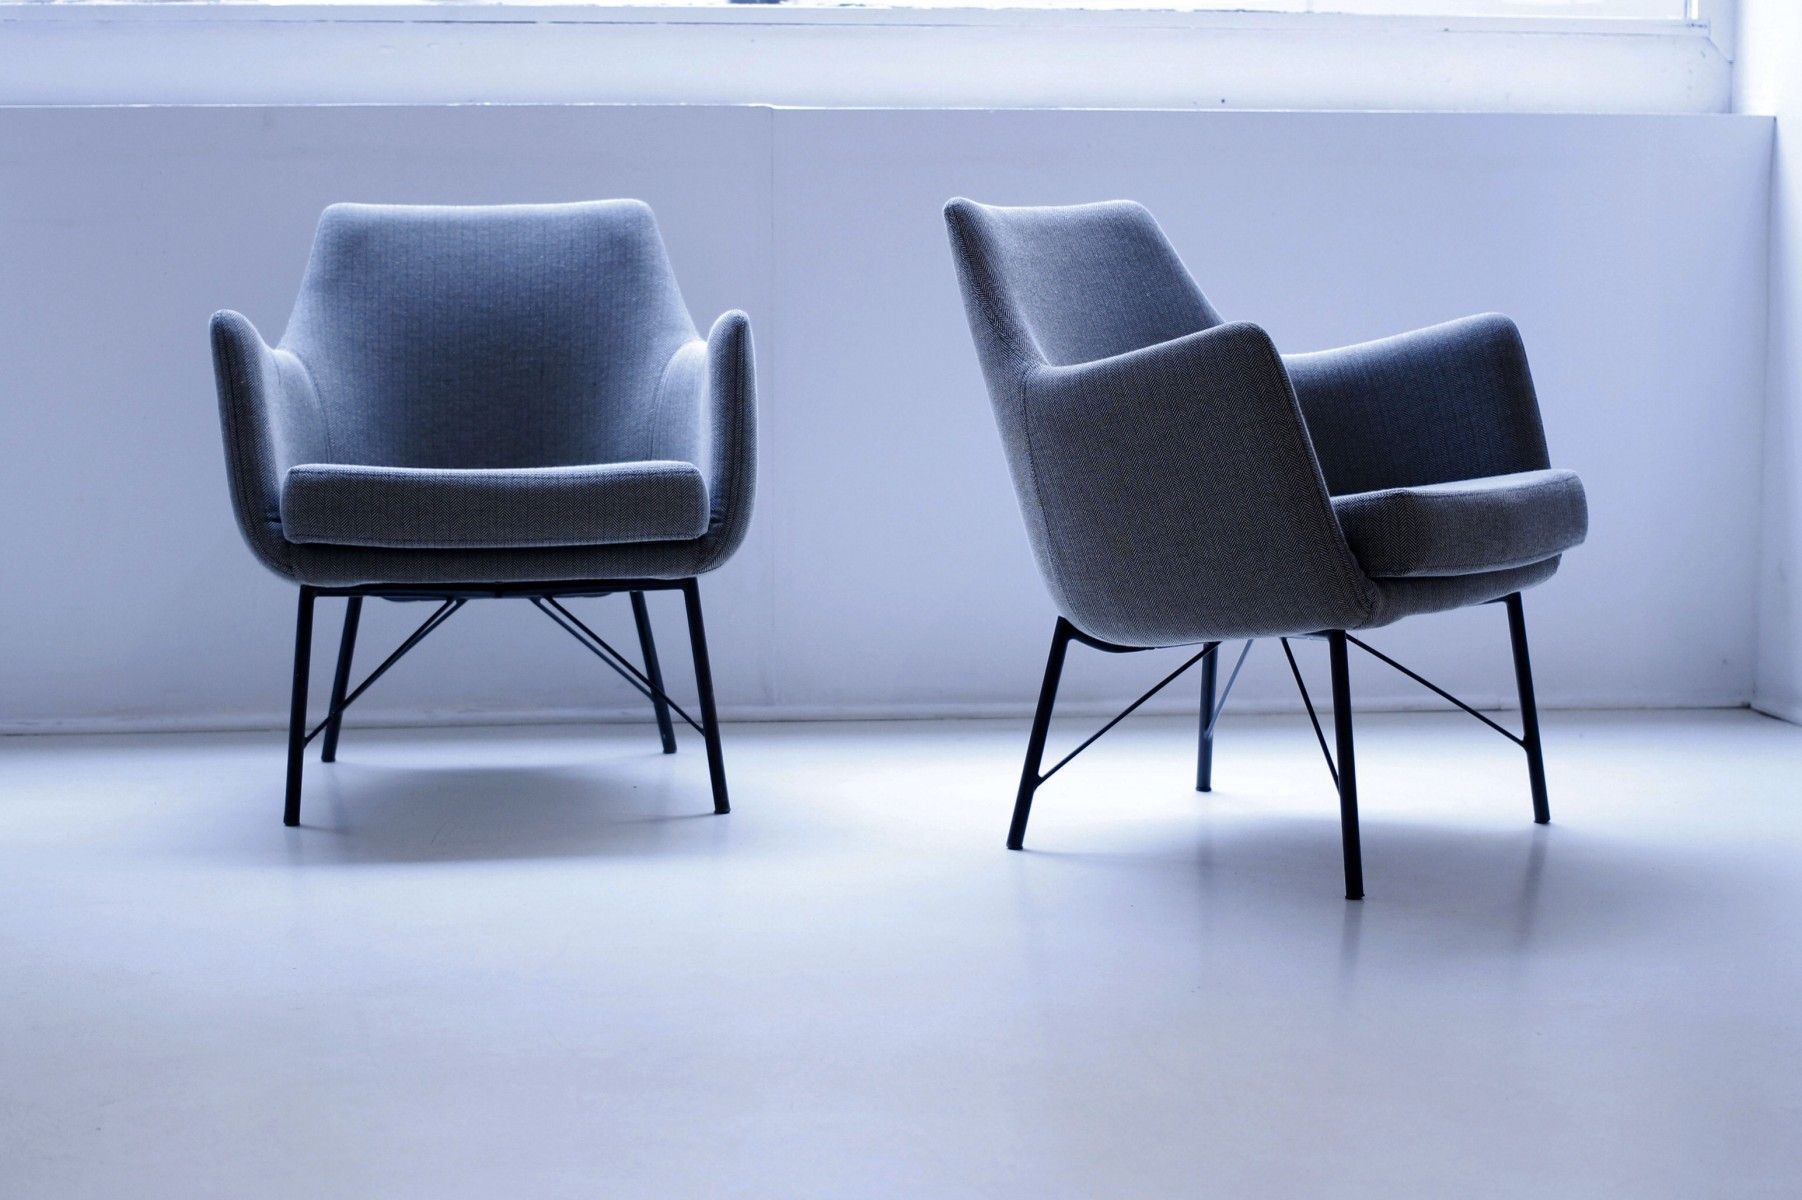 Sedie Gavina ~ Model 0393 wassily chair by marcel breuer for gavina 1960s 01